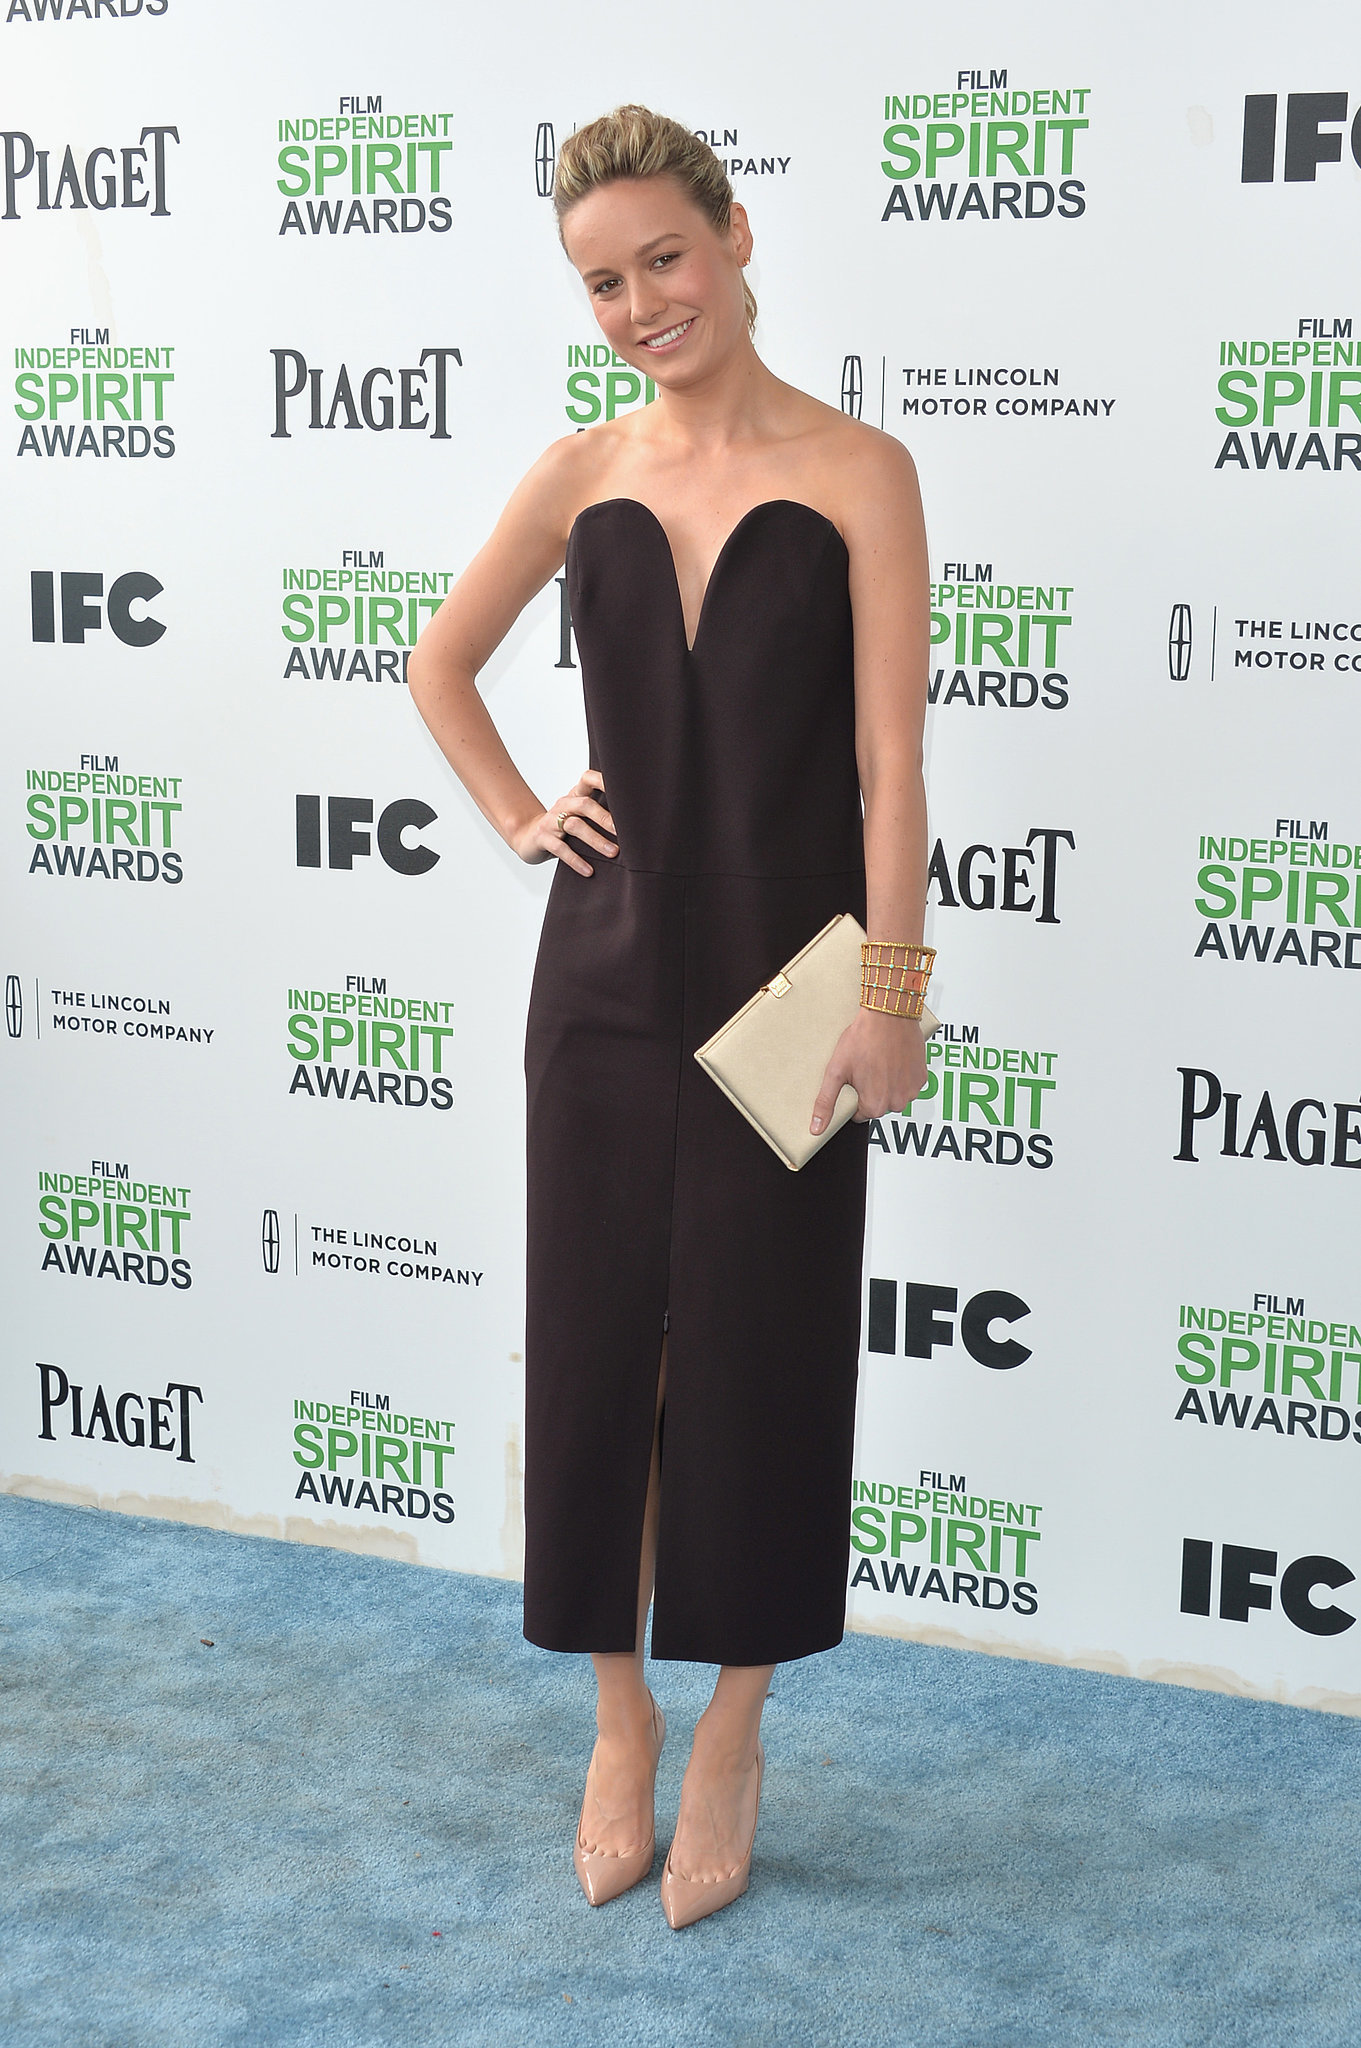 Brie Larson at the 2014 Spirit Awards